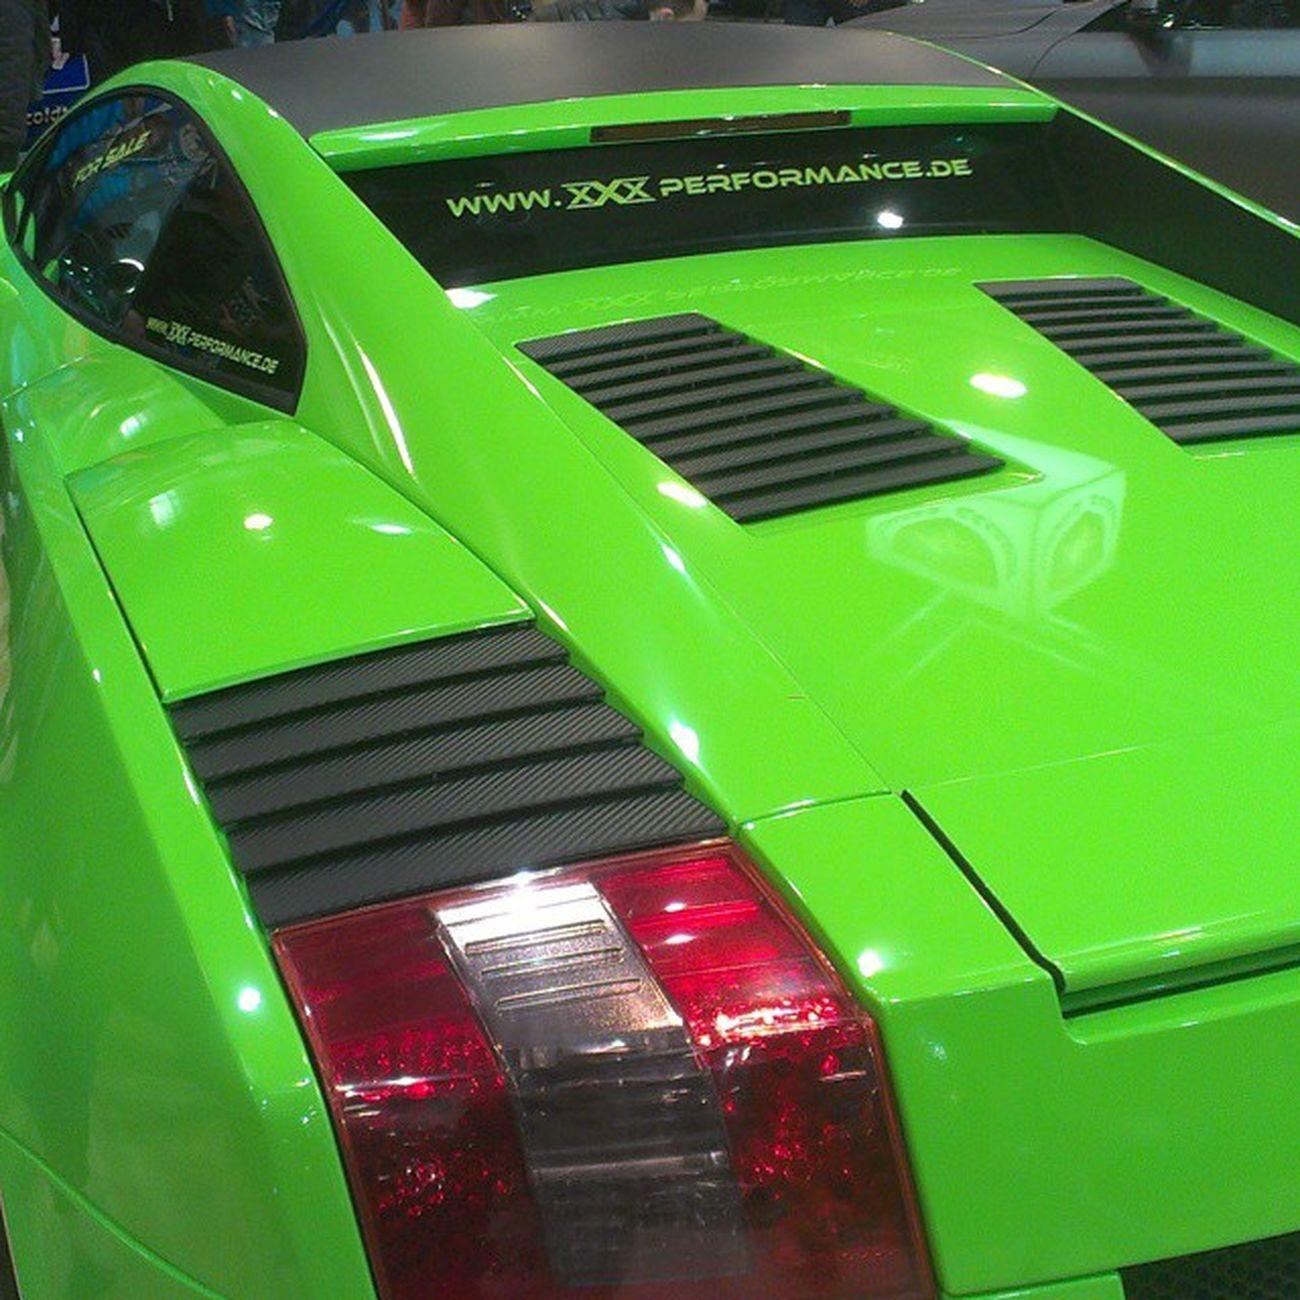 I saw a really nice Limegreen Lamborgini  yesterday :0 Traumauto Dreamcar